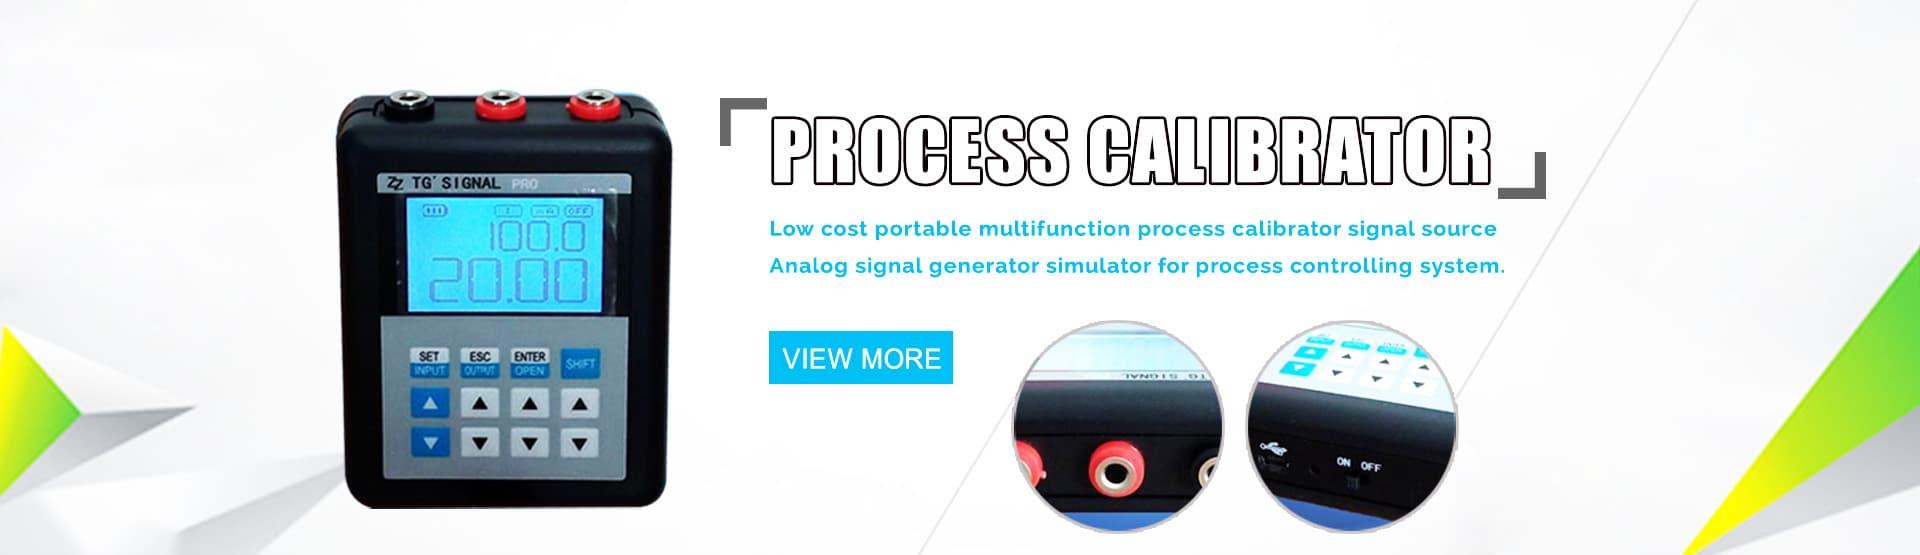 Multifunction Process Calibrator for 4-20mA mV Thermocouple